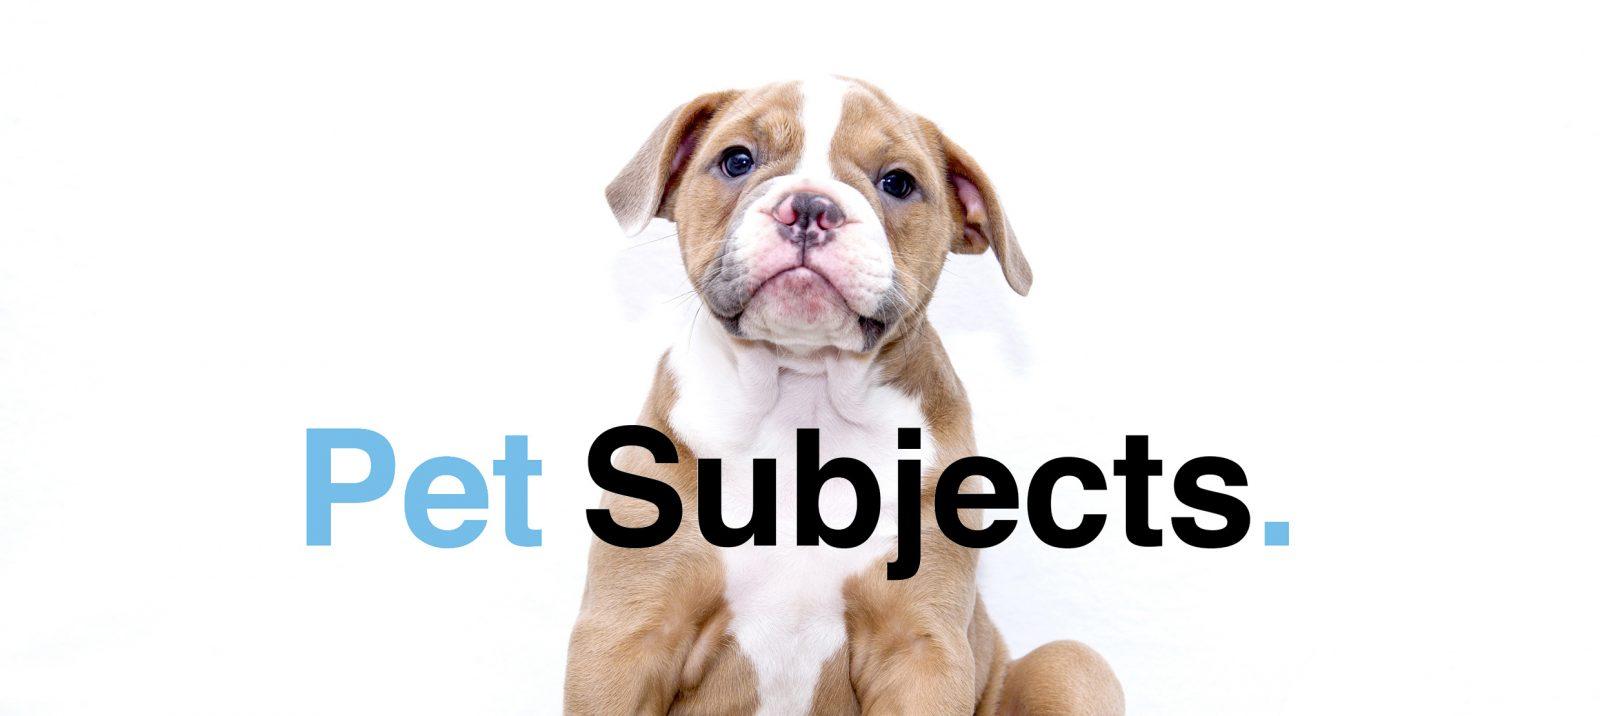 PetSubjects